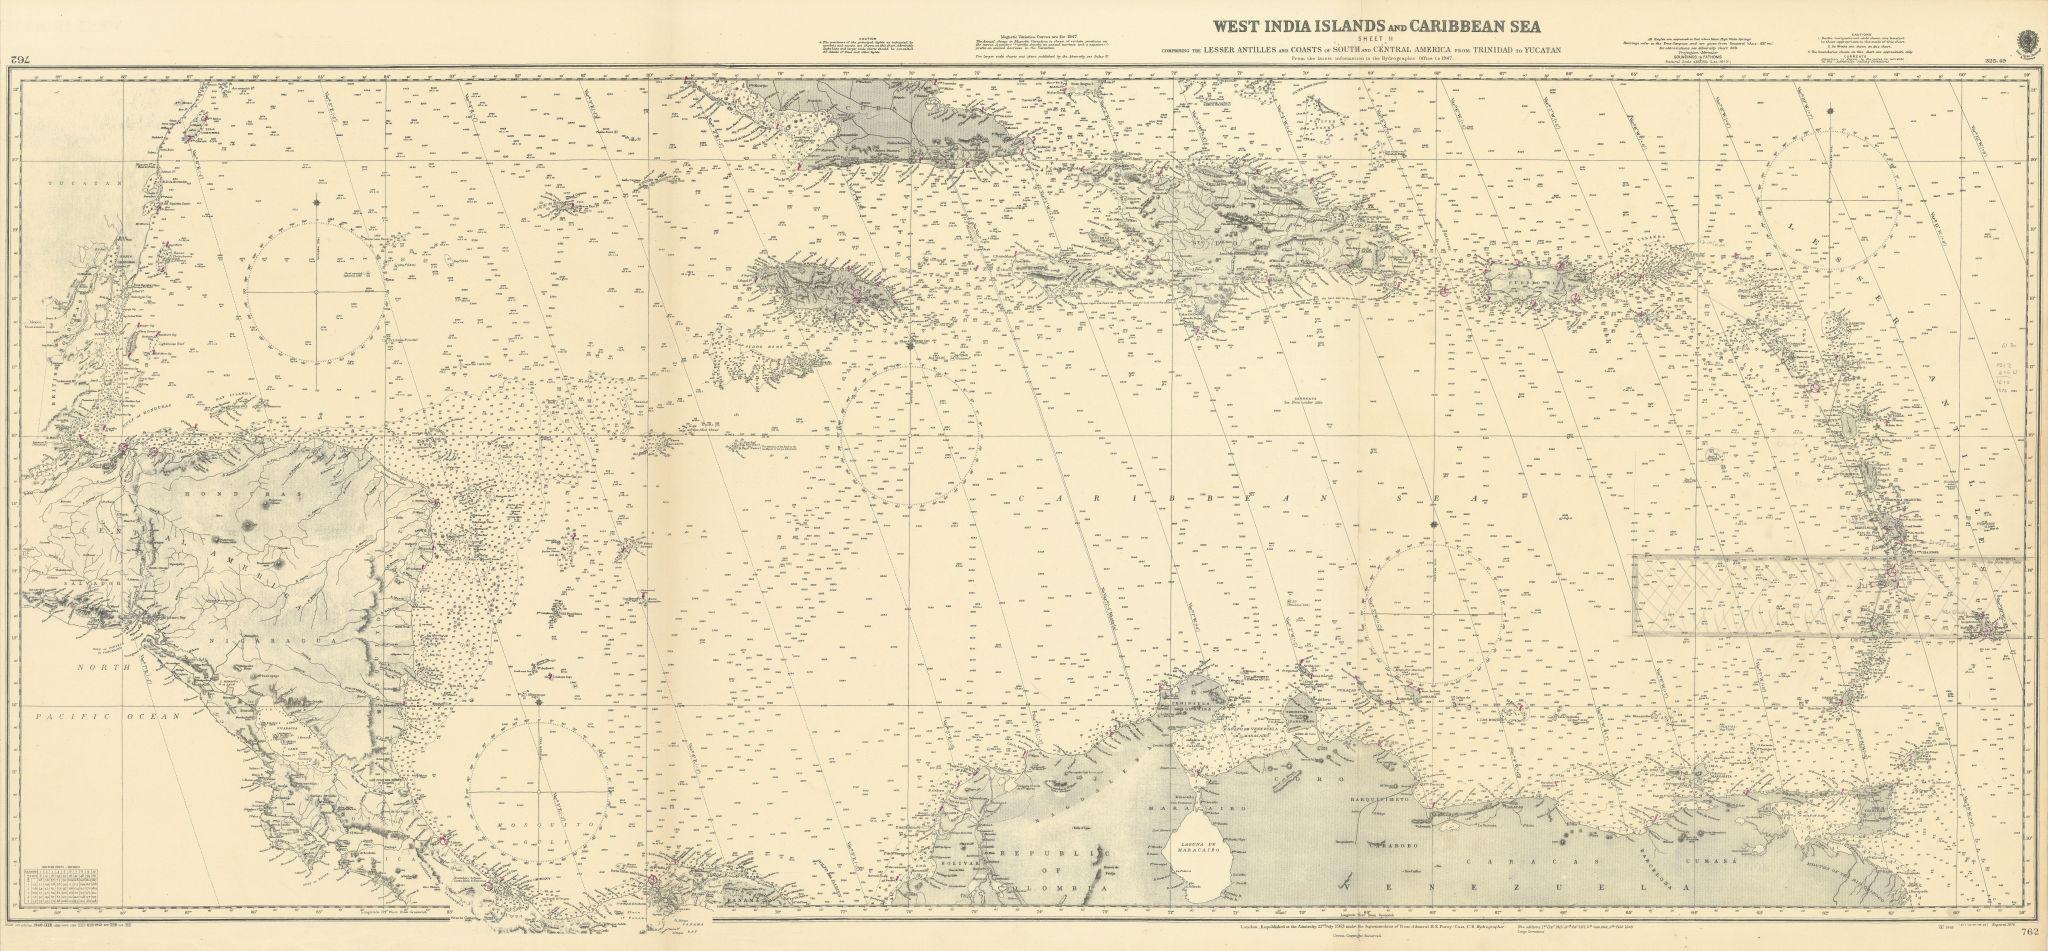 West India Islands & Caribbean Sea Sheet 2 ADMIRALTY sea chart 1913 (1949) map